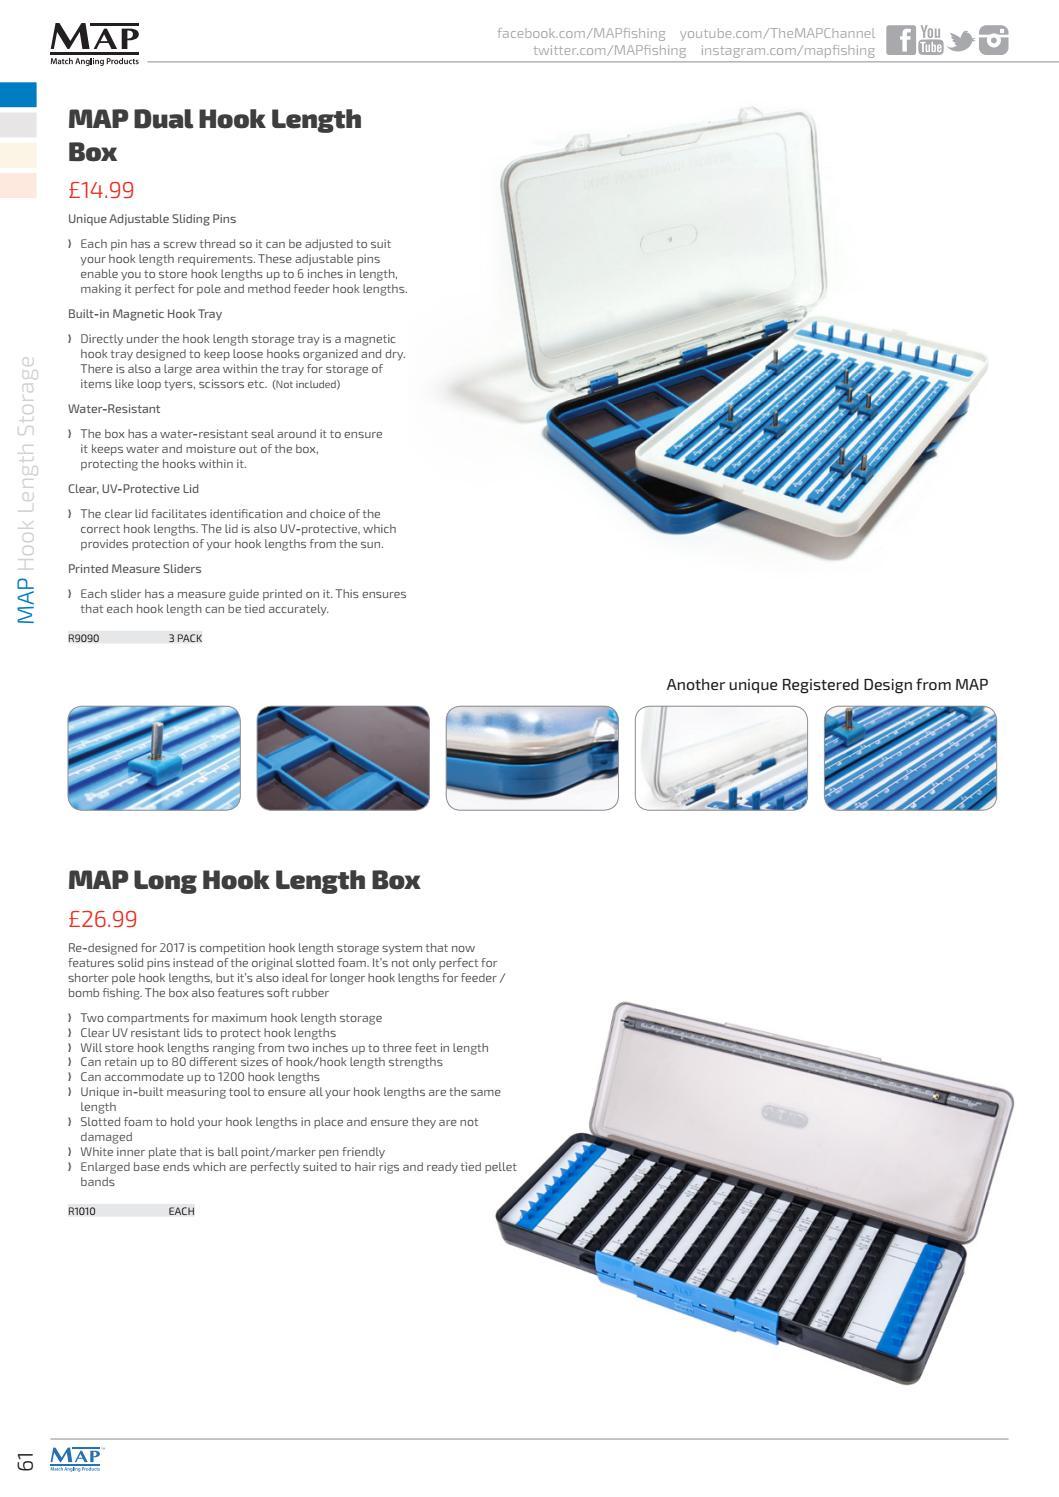 R1010 MAP Hooklength Box